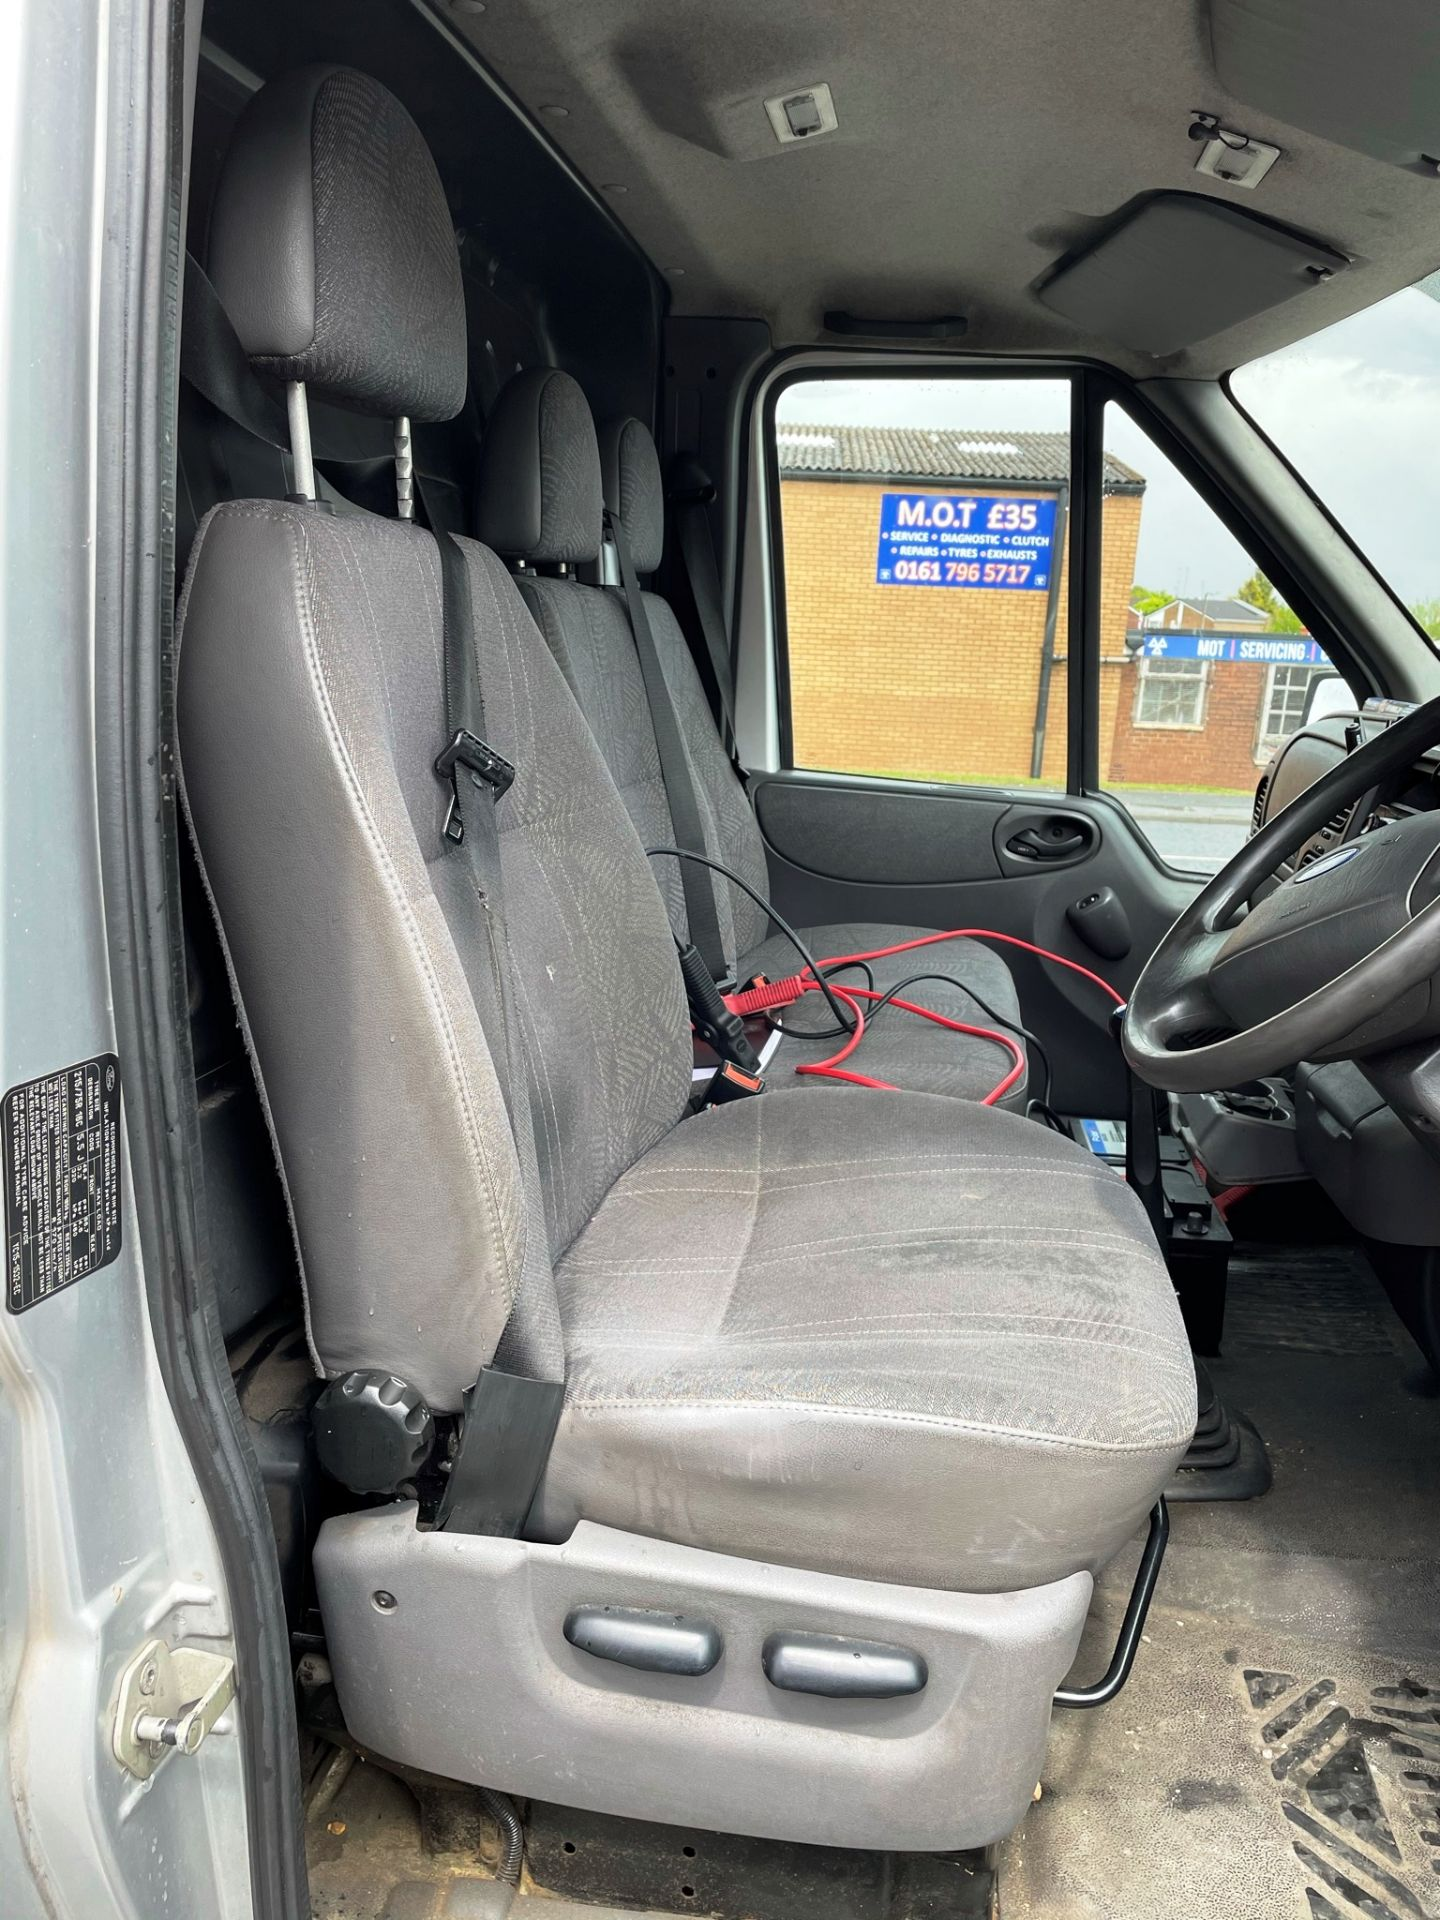 Ford Transit 350 LWB Panel Van   05 Plate  168,443 Miles - Image 18 of 22